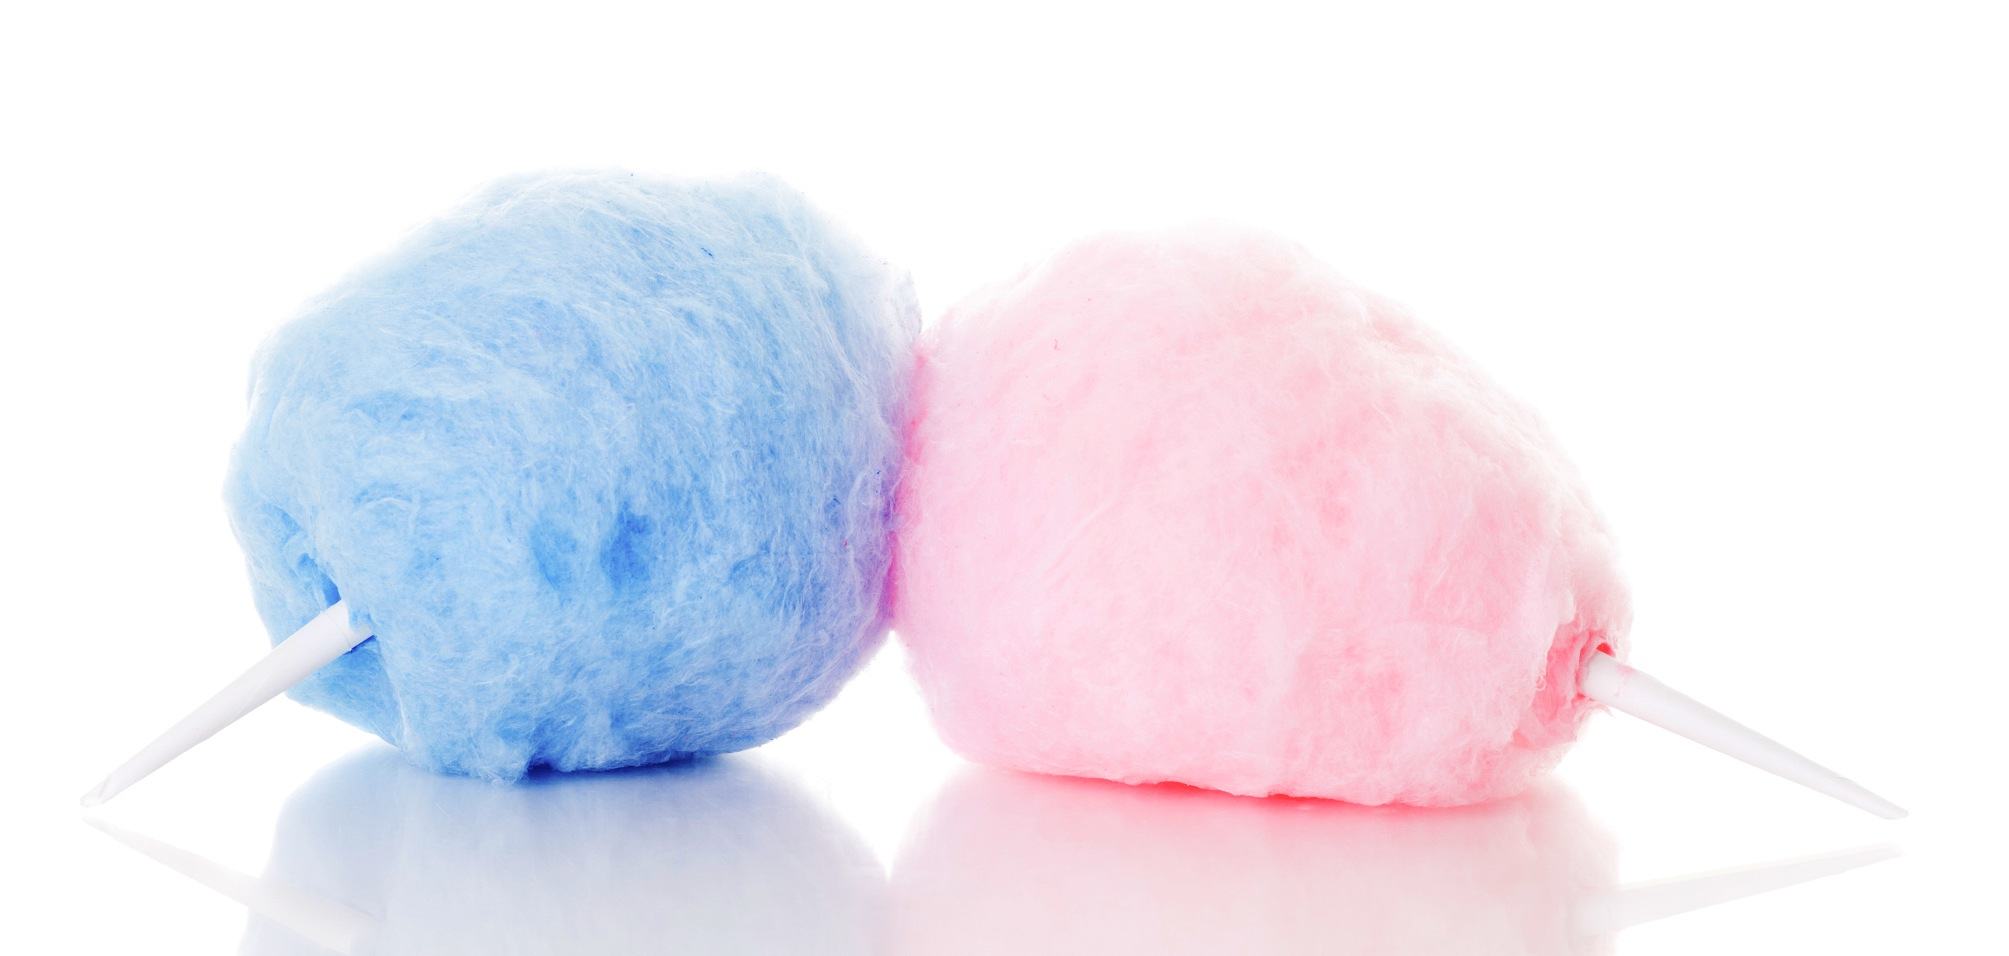 Cotton Candy flavor